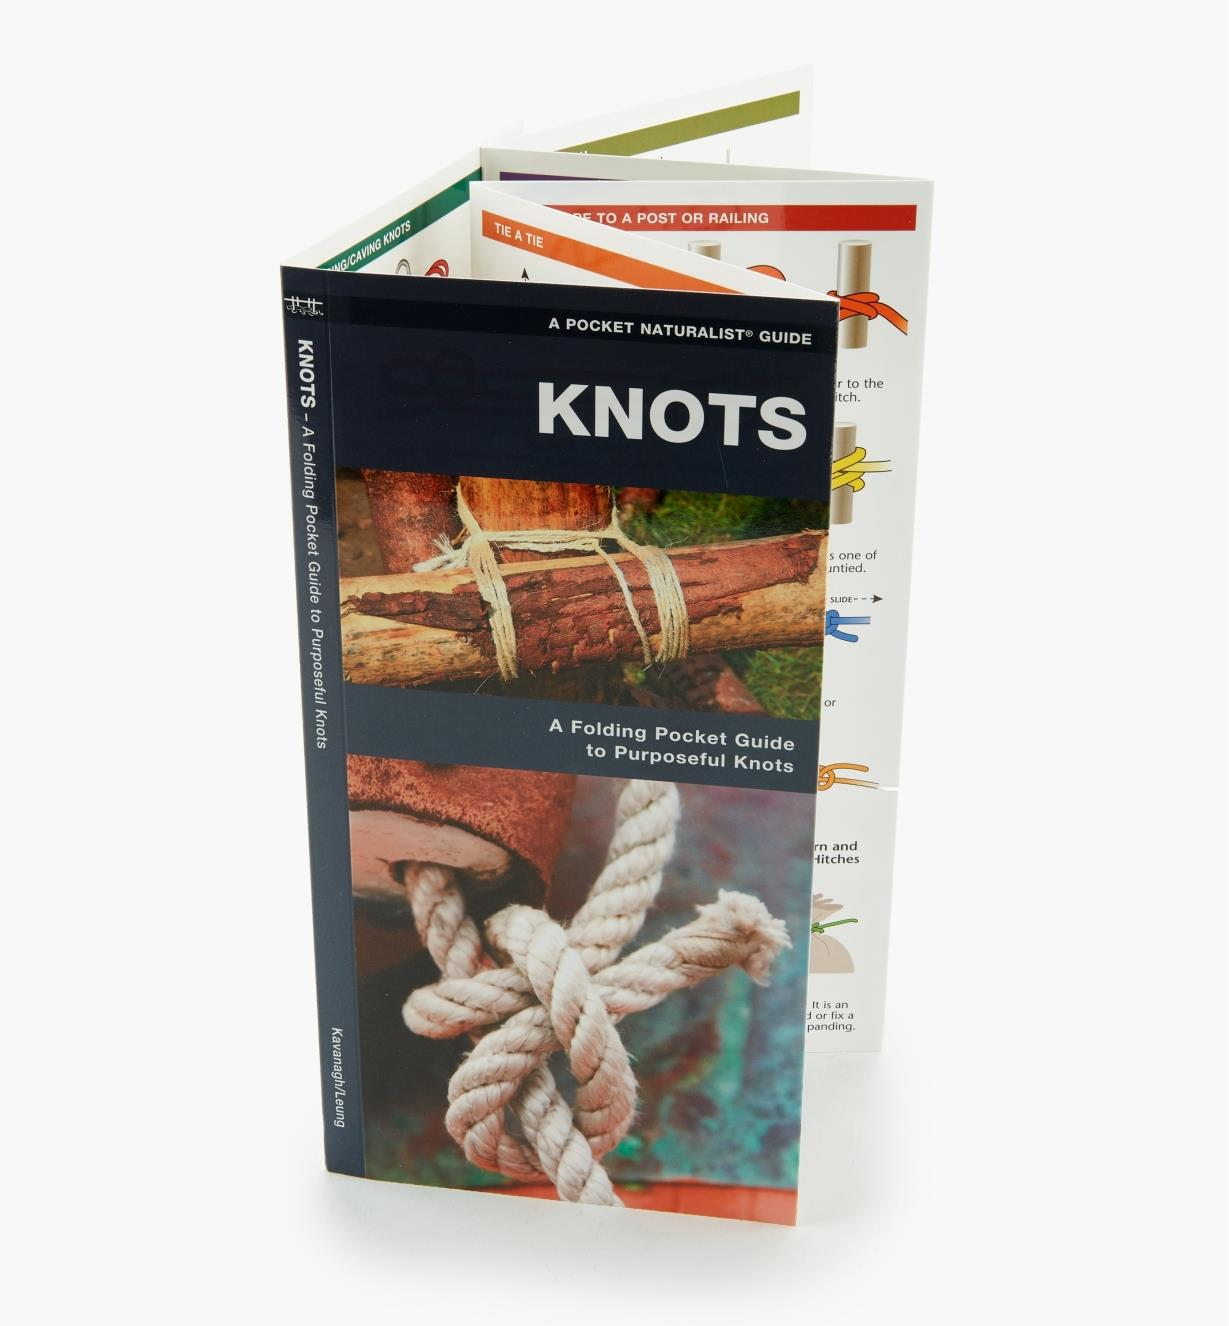 LA264 - Knots Pocket Guide